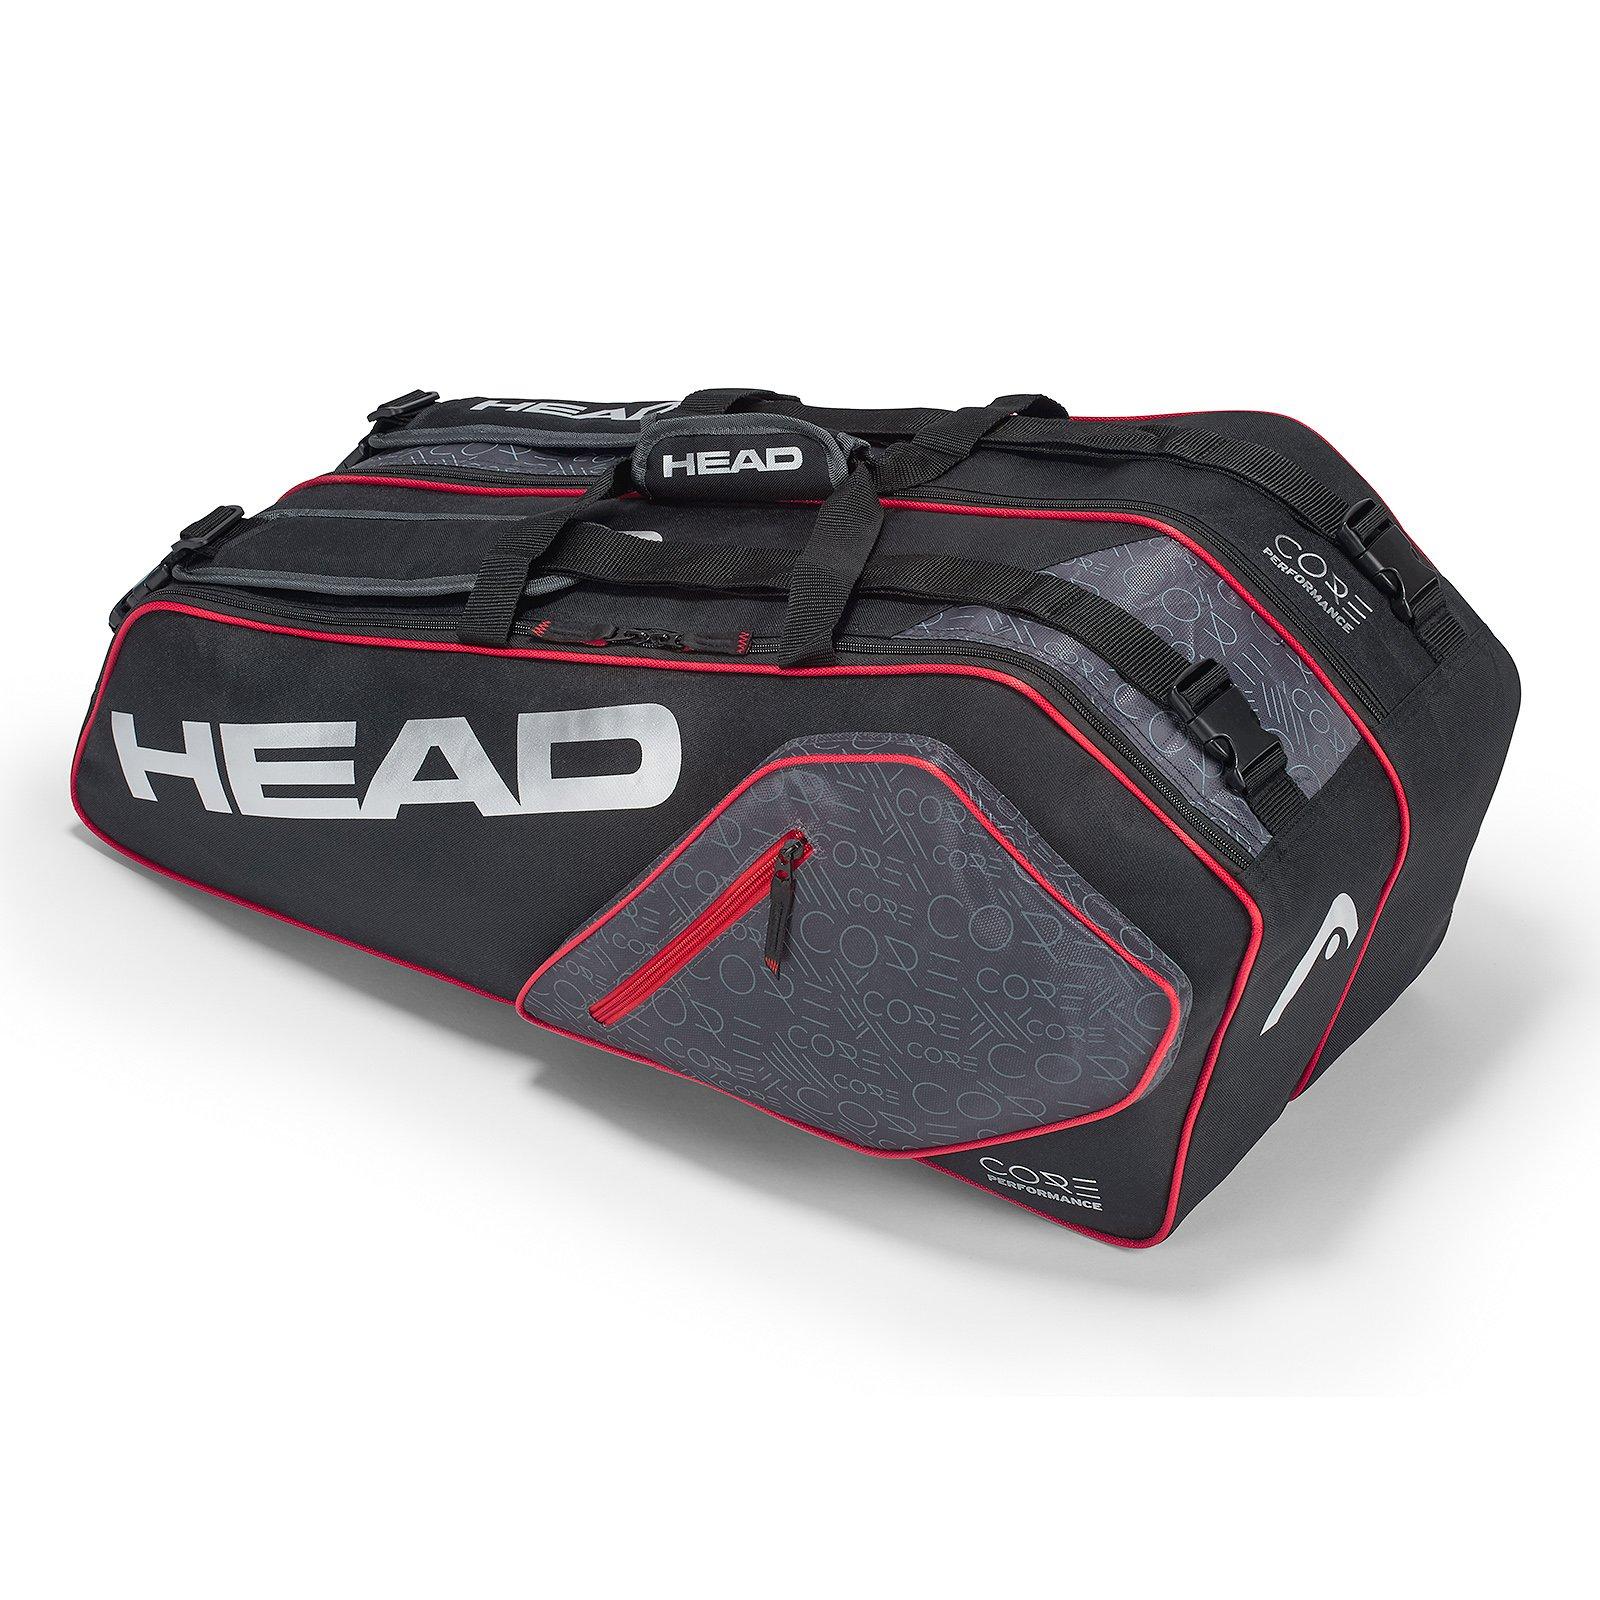 HEAD Core Combi 6 Racquet Bag (Black/Silver)